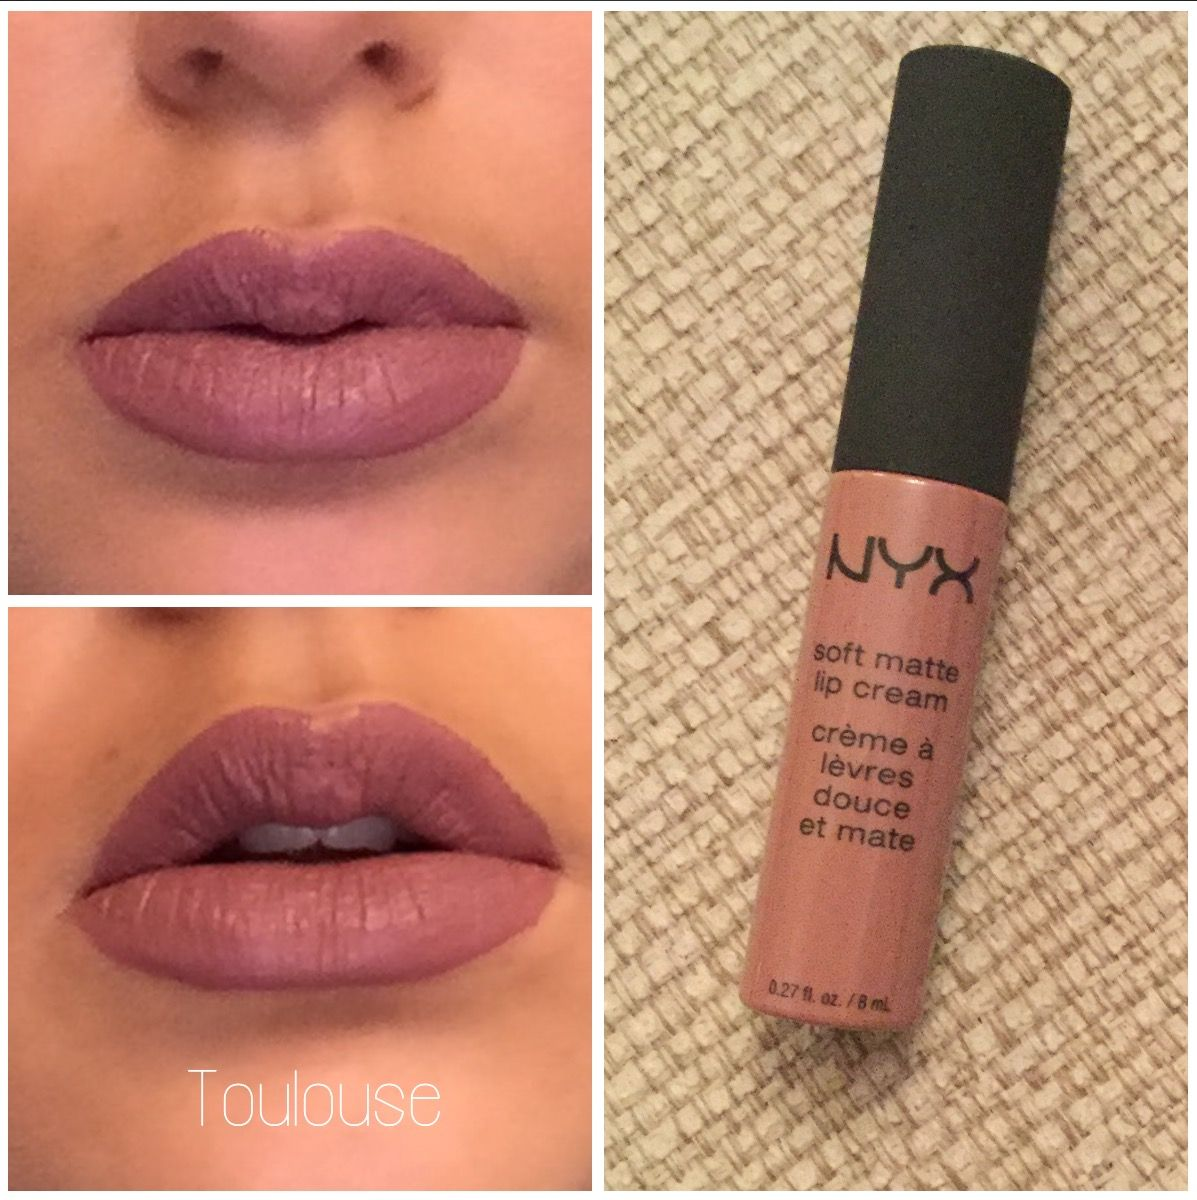 Nyx Soft Matte Lip Cream Toulouse Make Up In 2018 Pinterest Over Lipcream Makeup Looks Lipstick